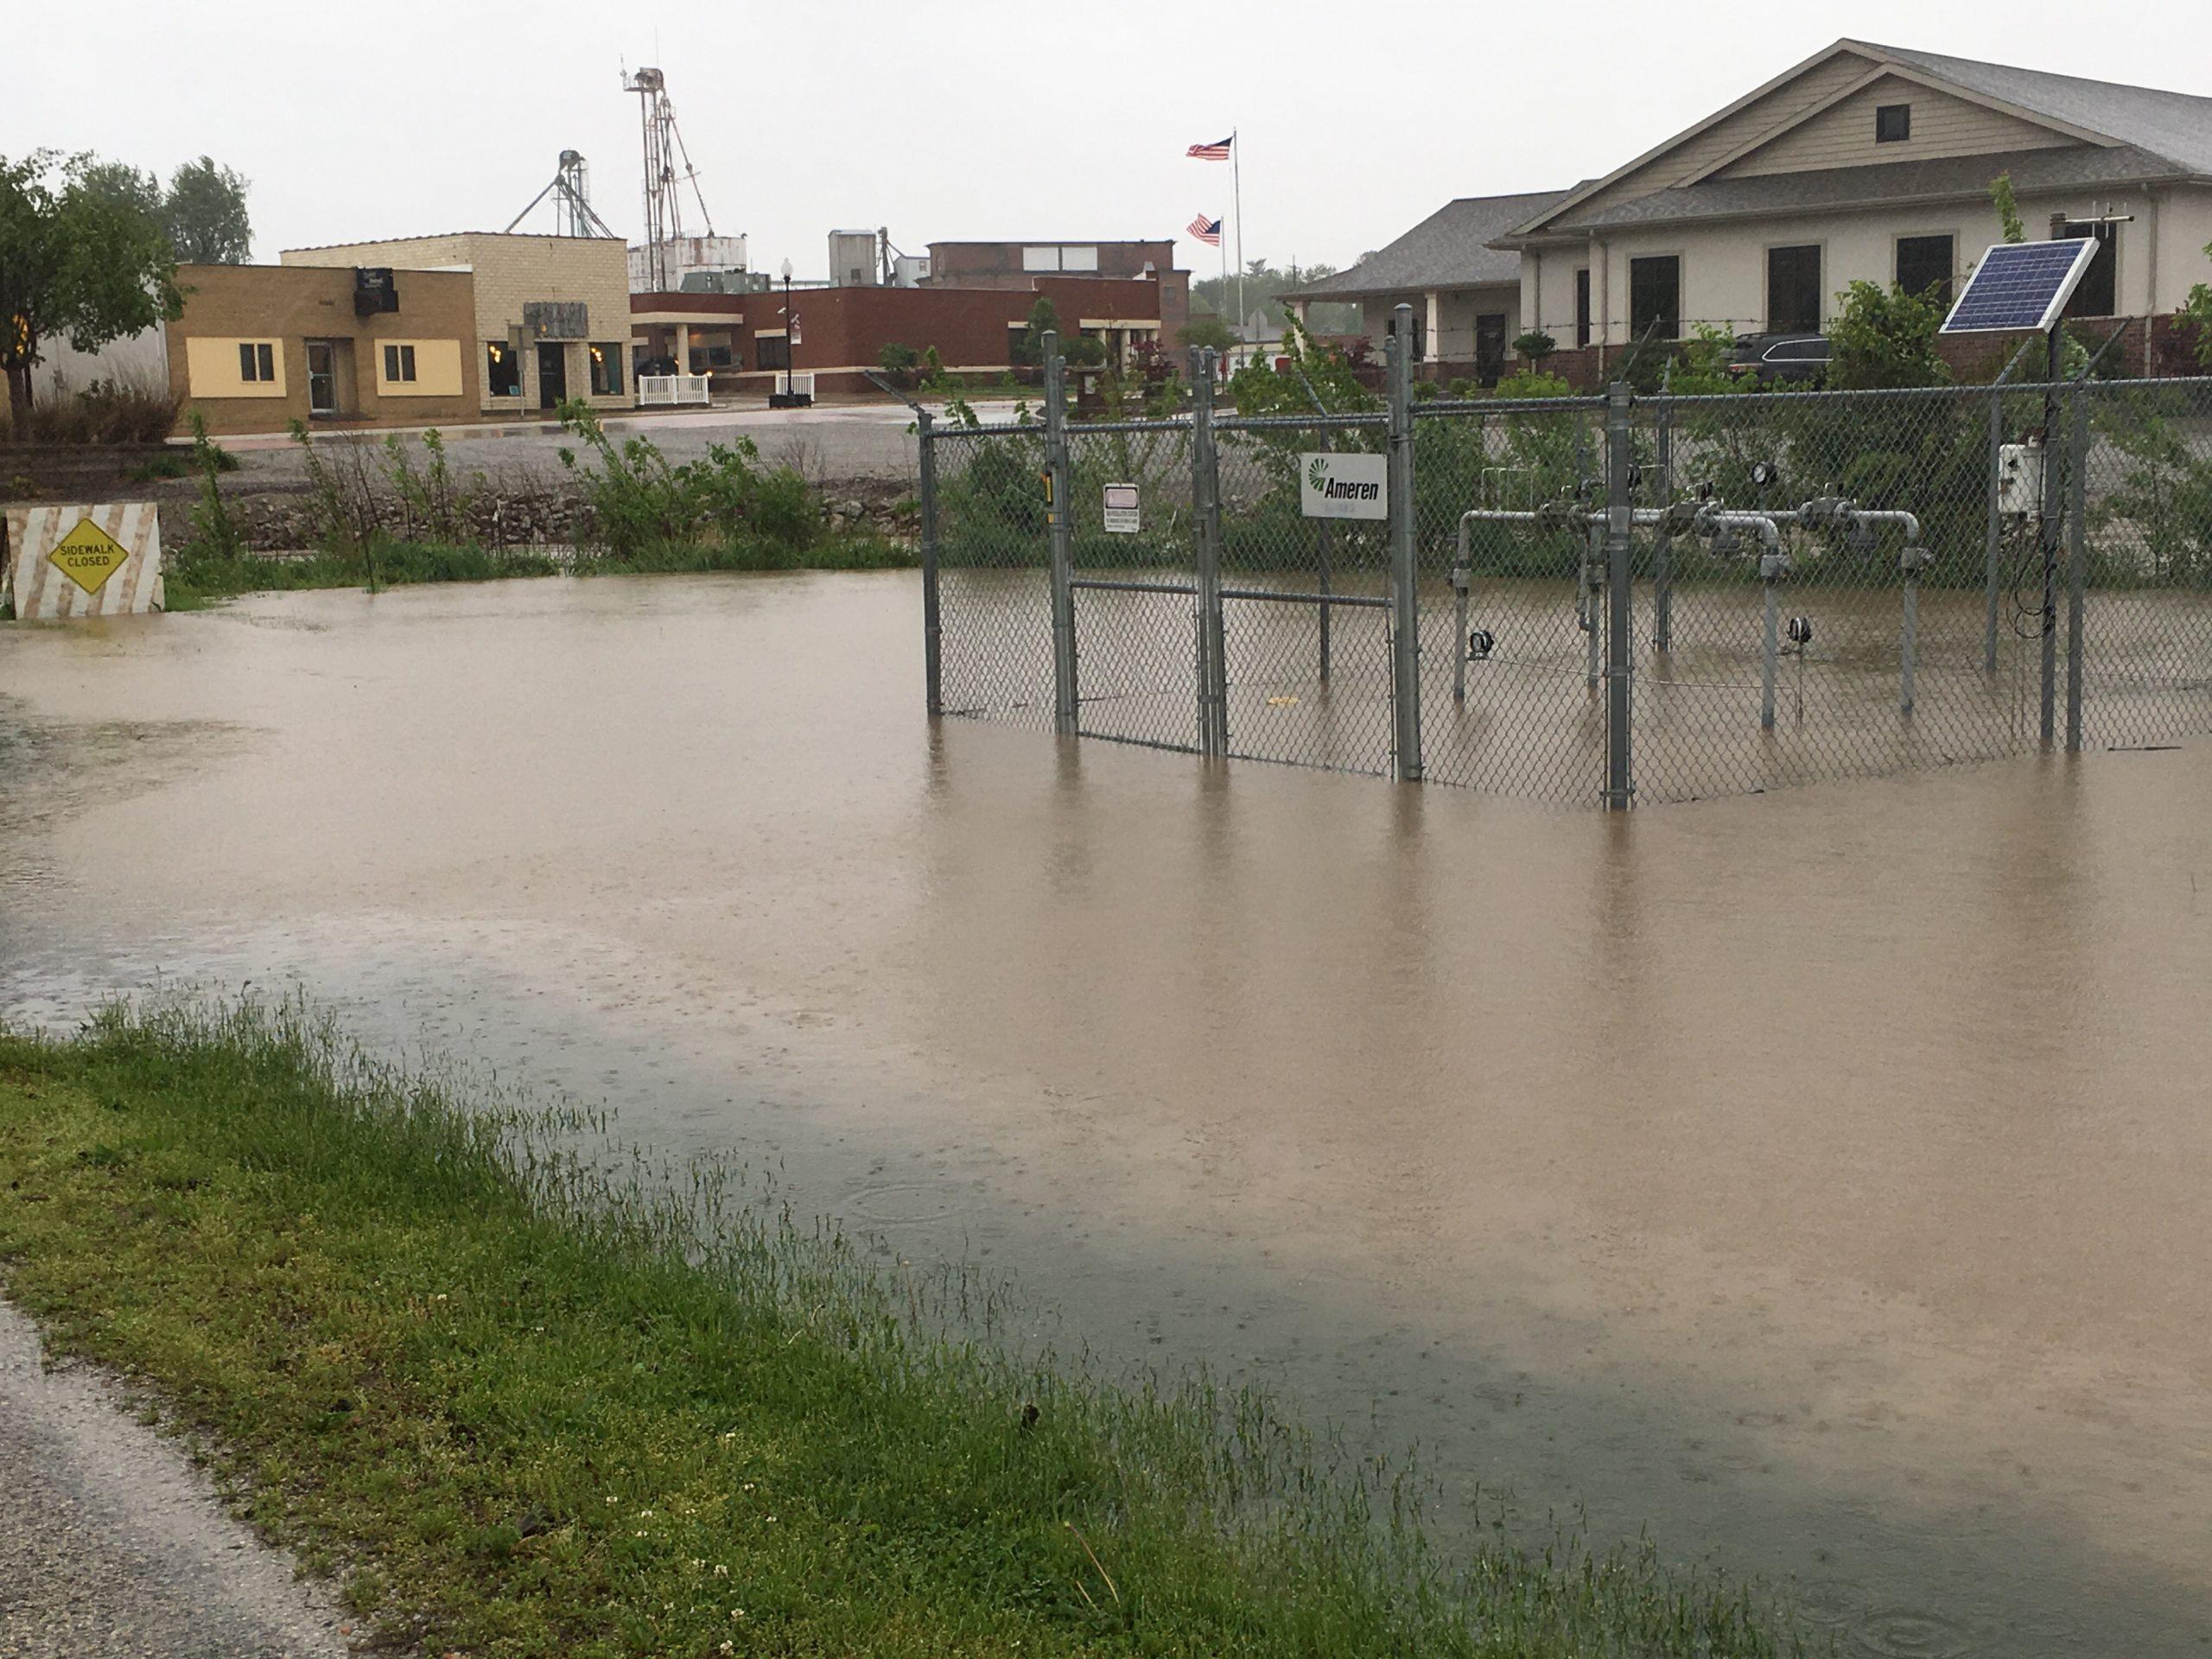 Entire Listening Area Under Flash Flood Warning